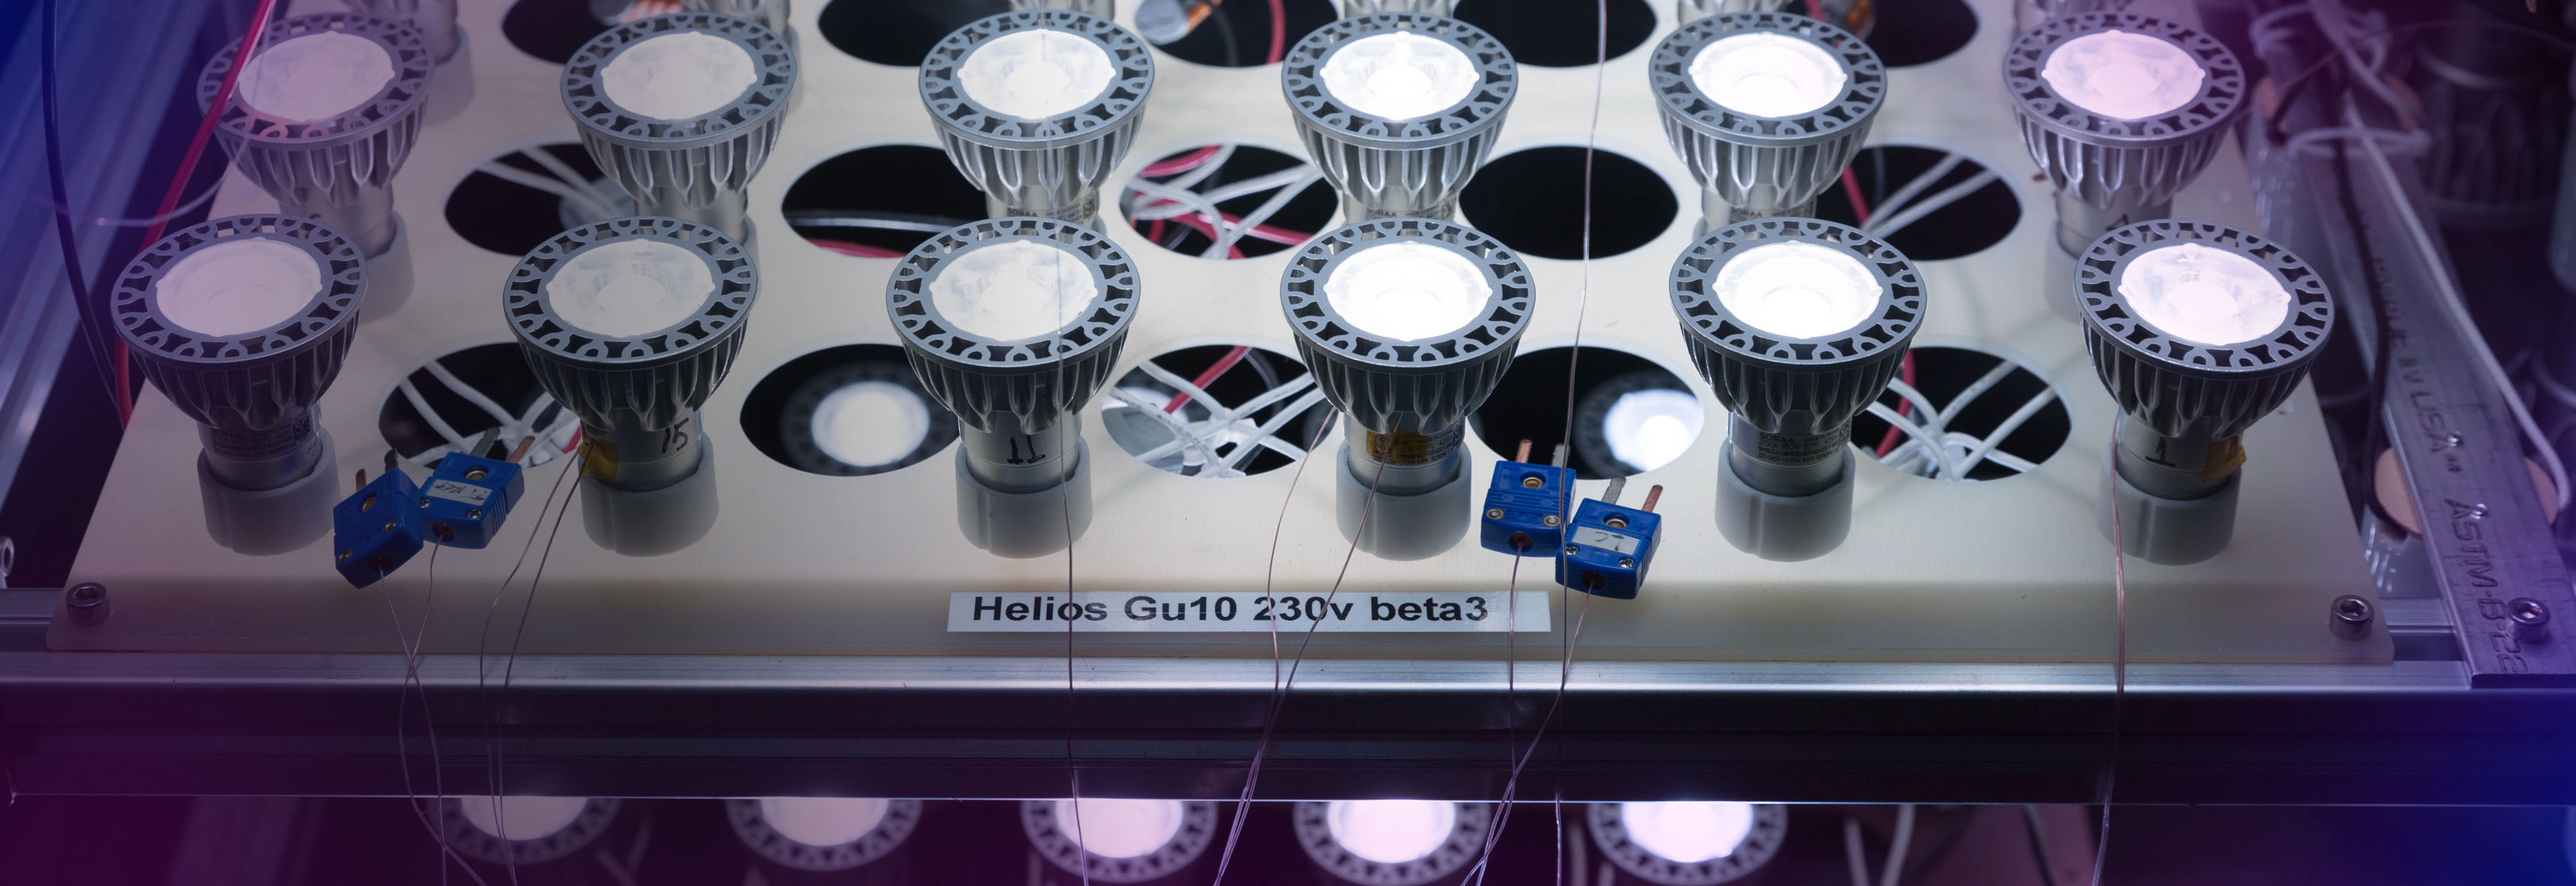 products-lamps-header-image Wunderbar Led Lampen E14 Warmweiß Dekorationen